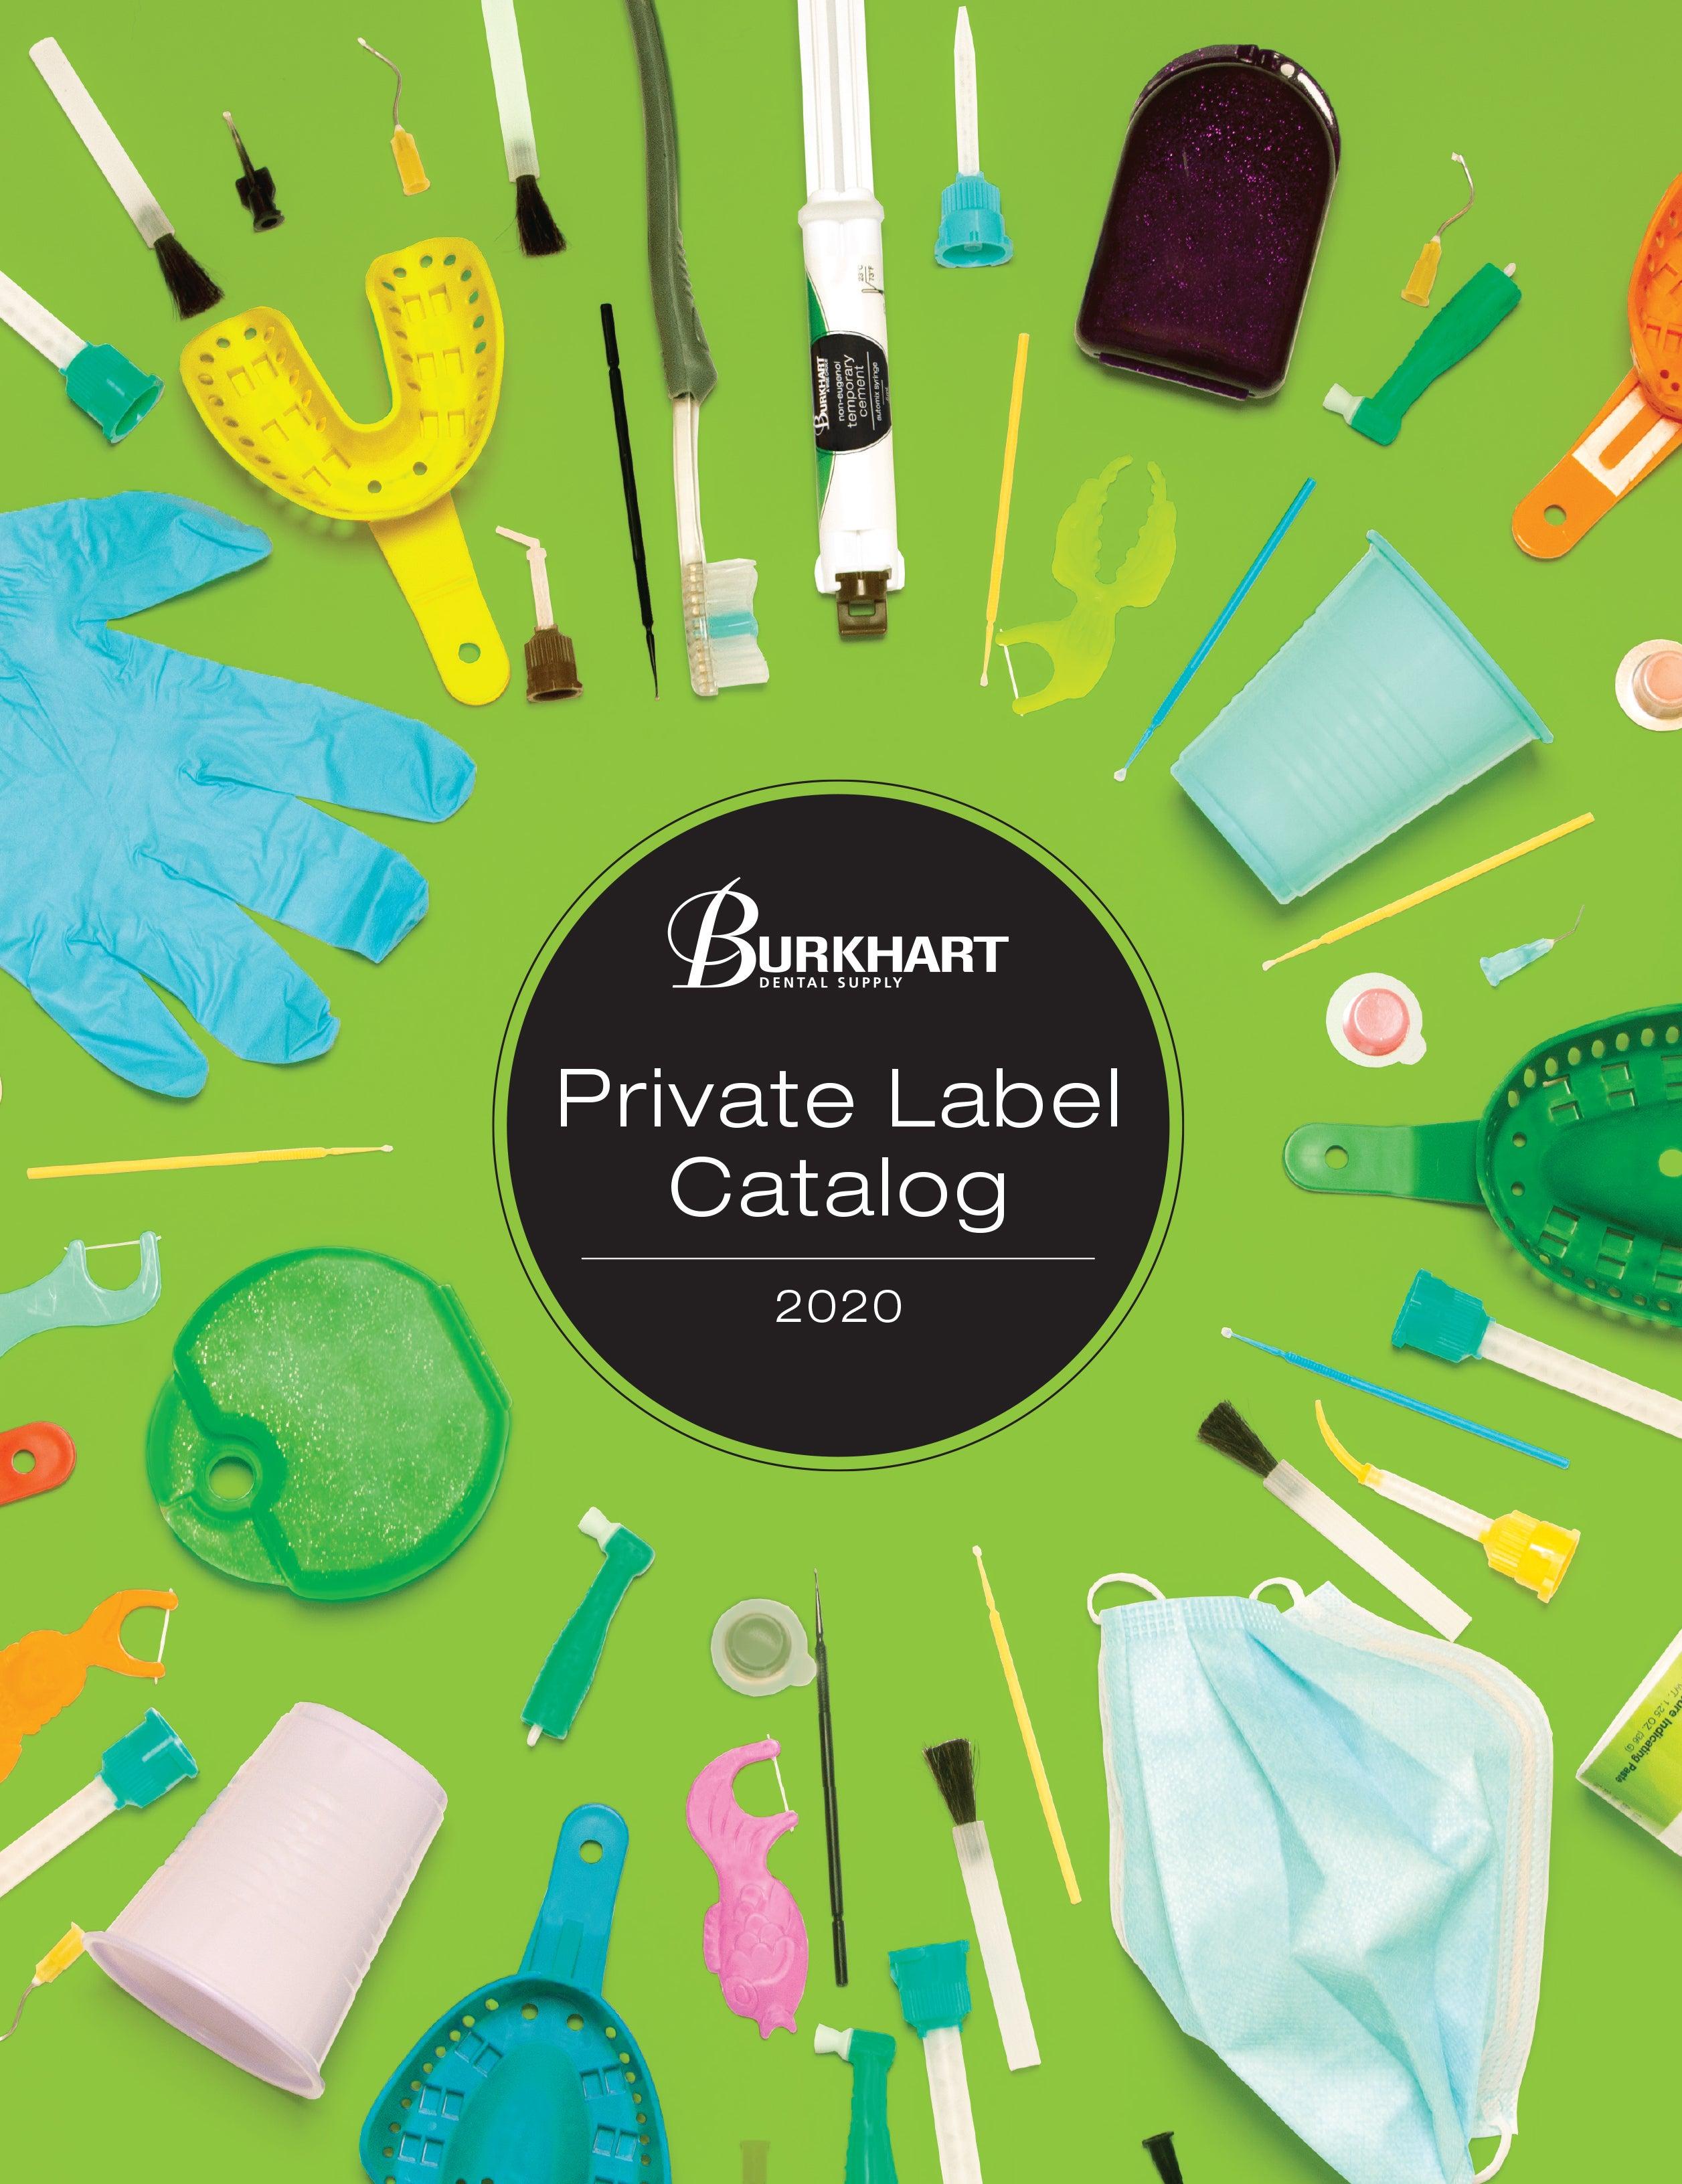 Burkhart Private Label Catalog 2019 1